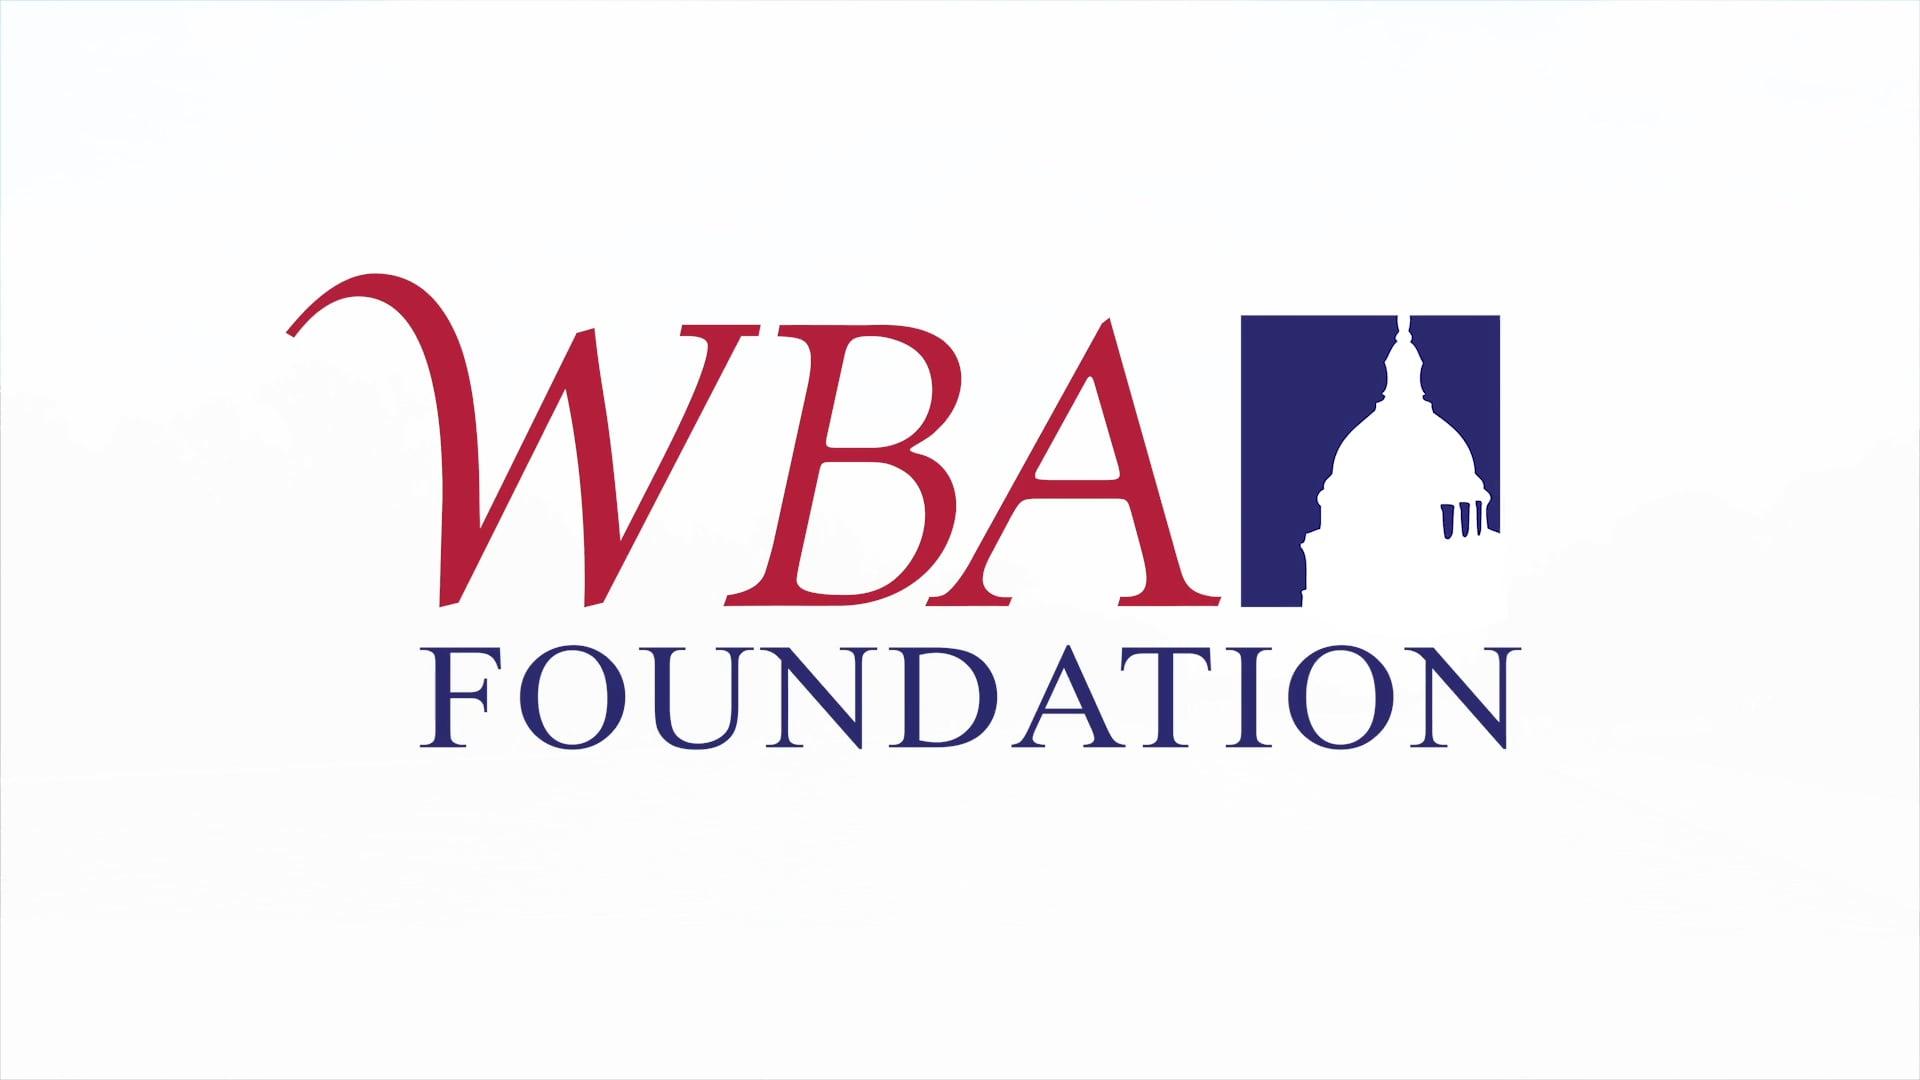 WBA FOUNDATION 2018